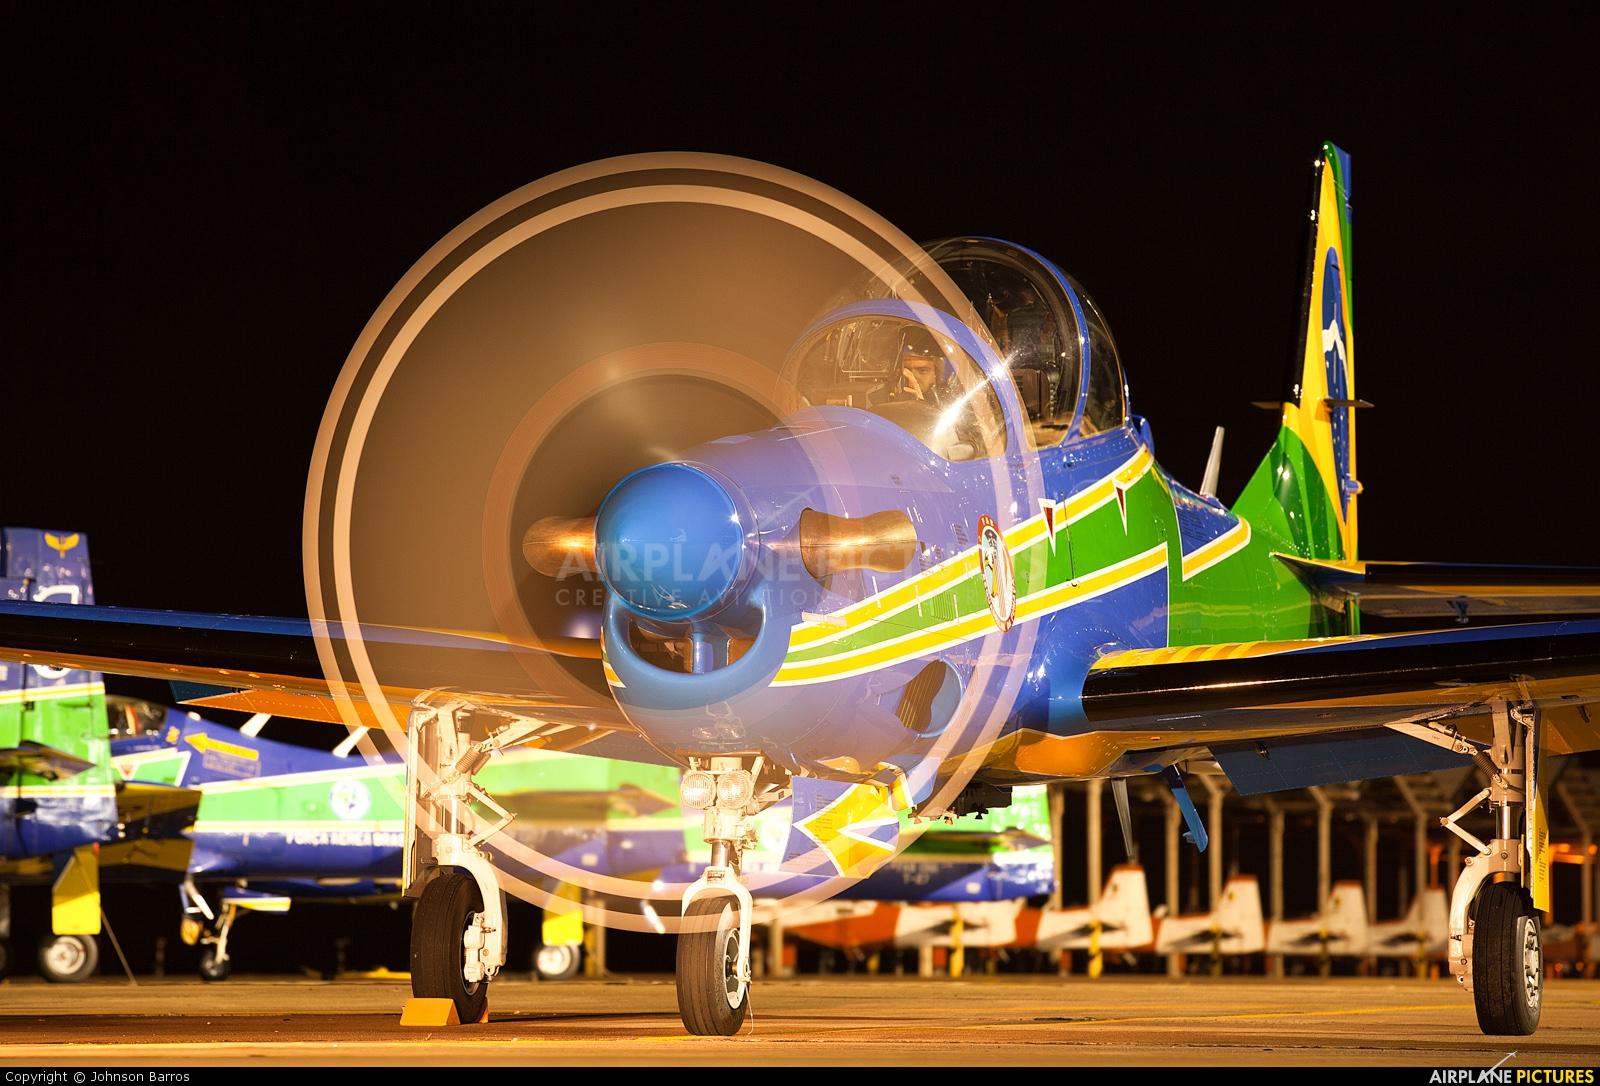 Brazil - Air Force 5966 aircraft at Pirassununga (Campo Fontenelle)